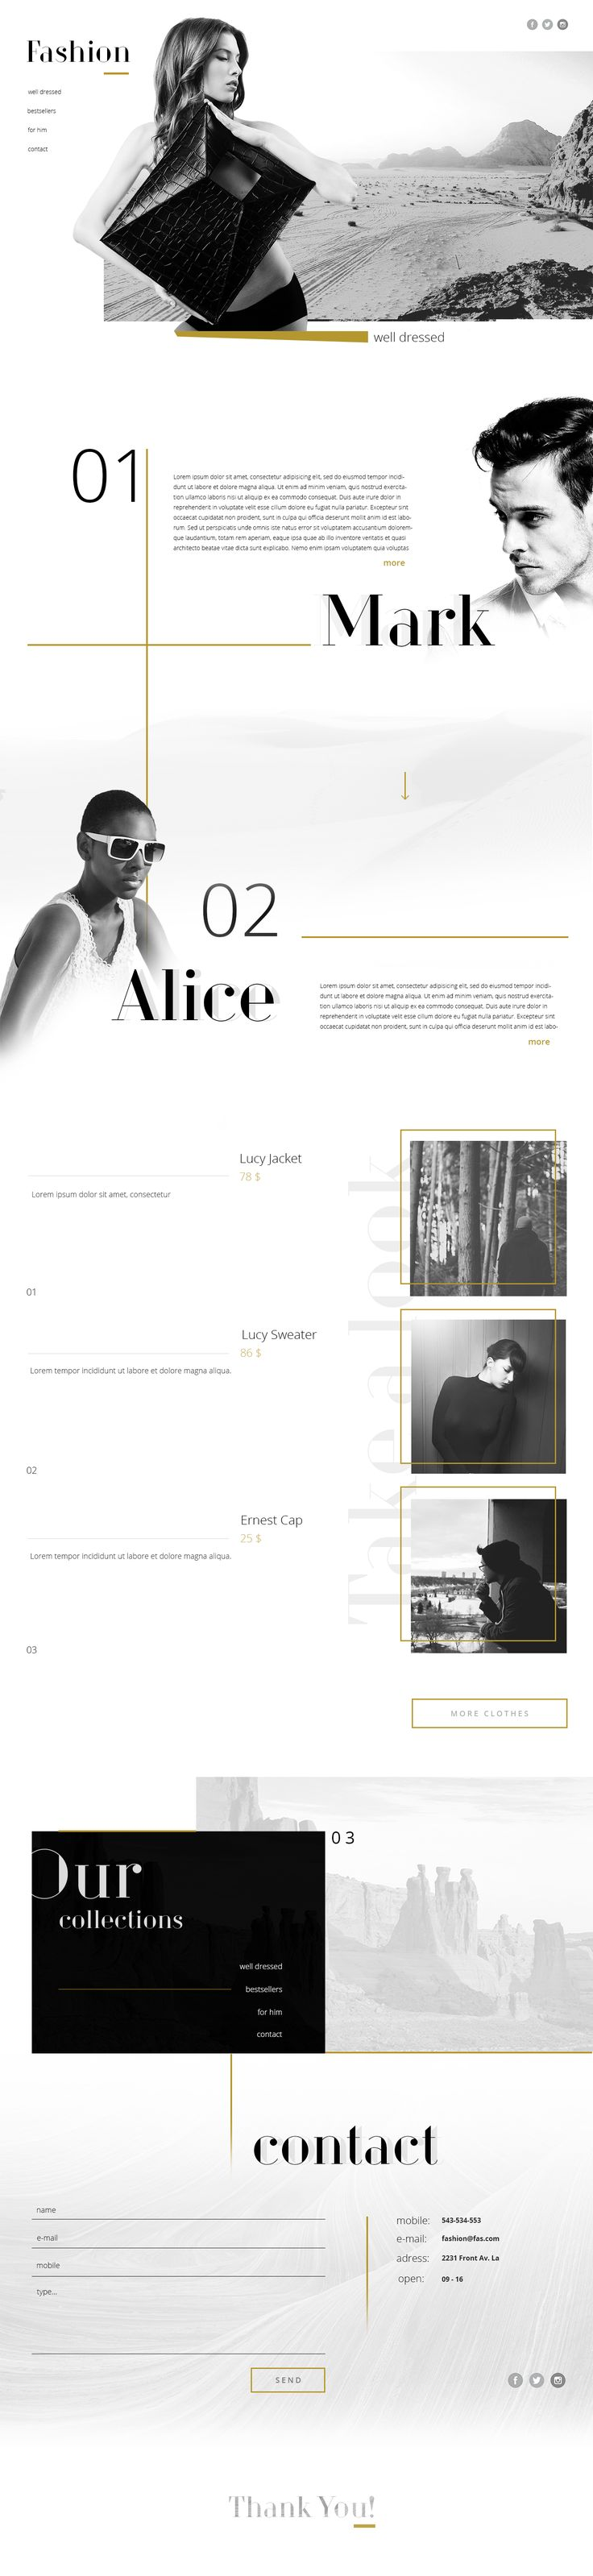 "Web design inspiration UI/UX user experience fashion concept  @Behance: ""Fashion Portfolio Website"" https://www.behance.net/gallery/47444829/Fashion-Portfolio-Website"